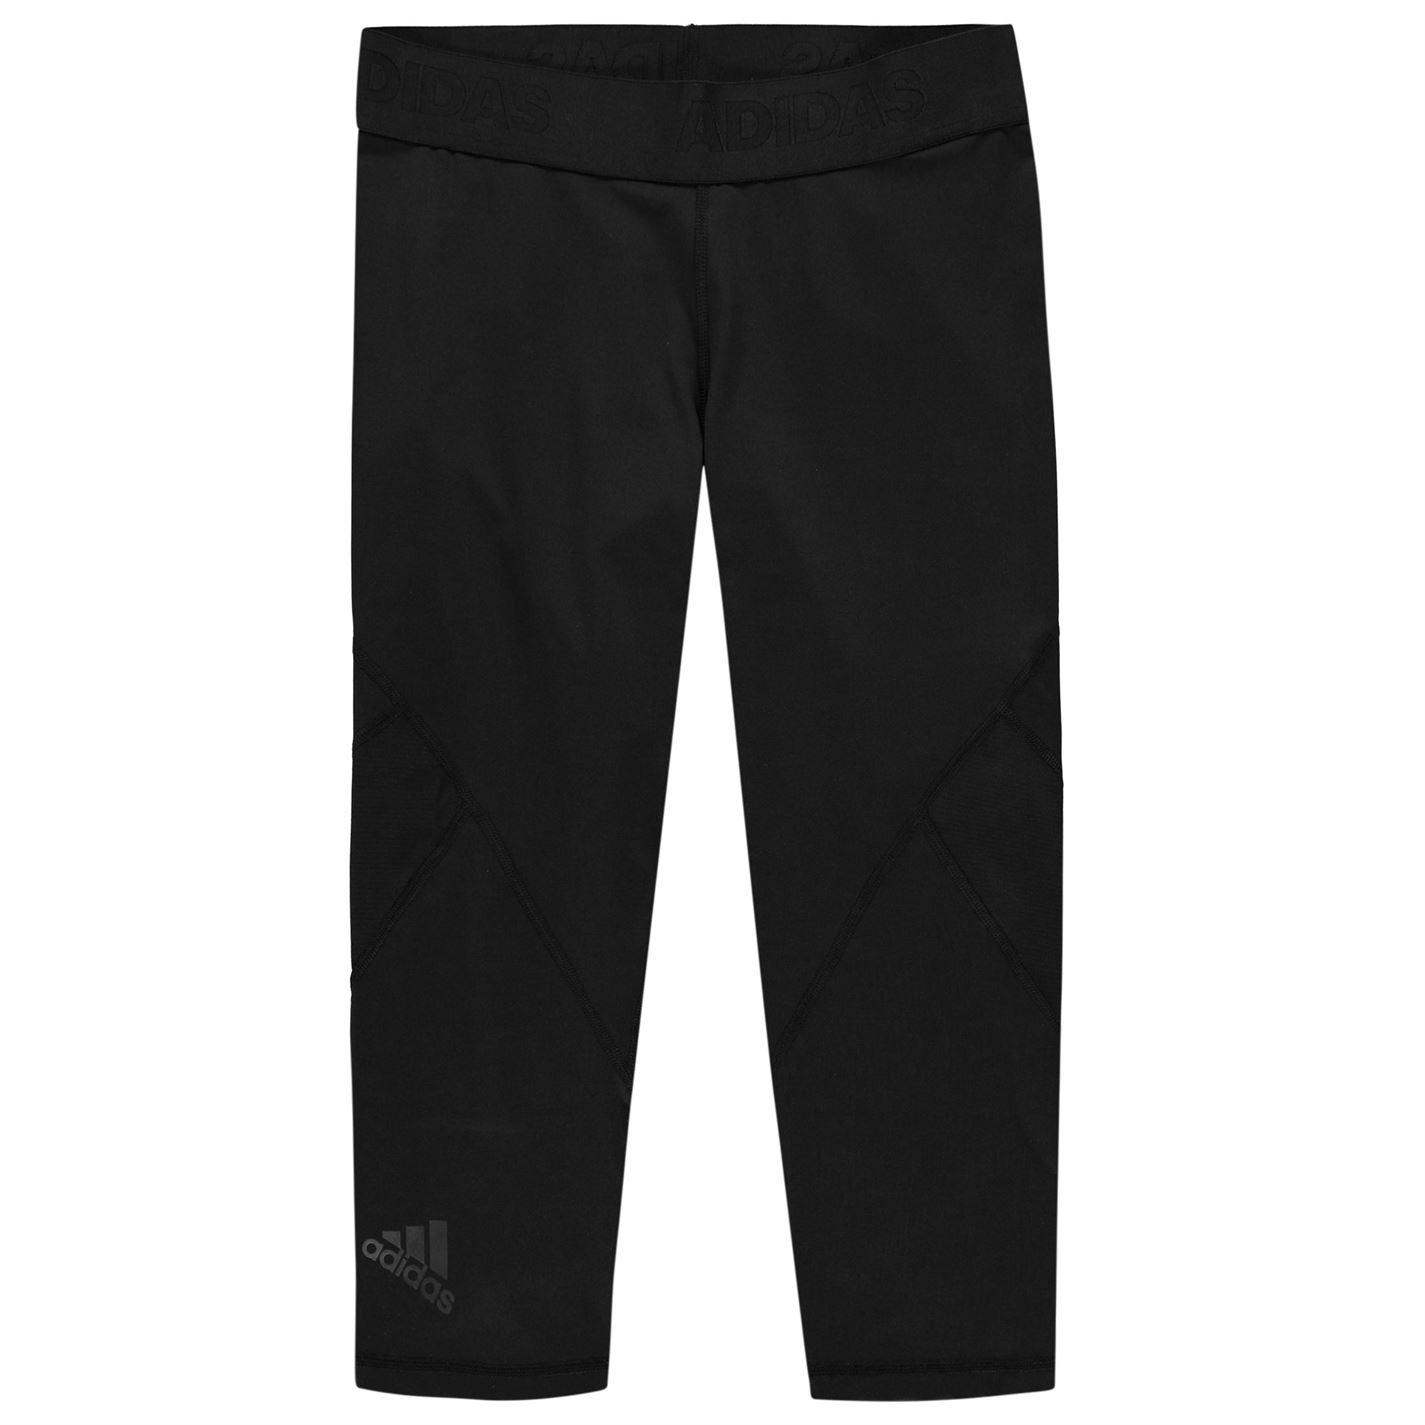 adidas Alphaskin three quarter Pants dámské